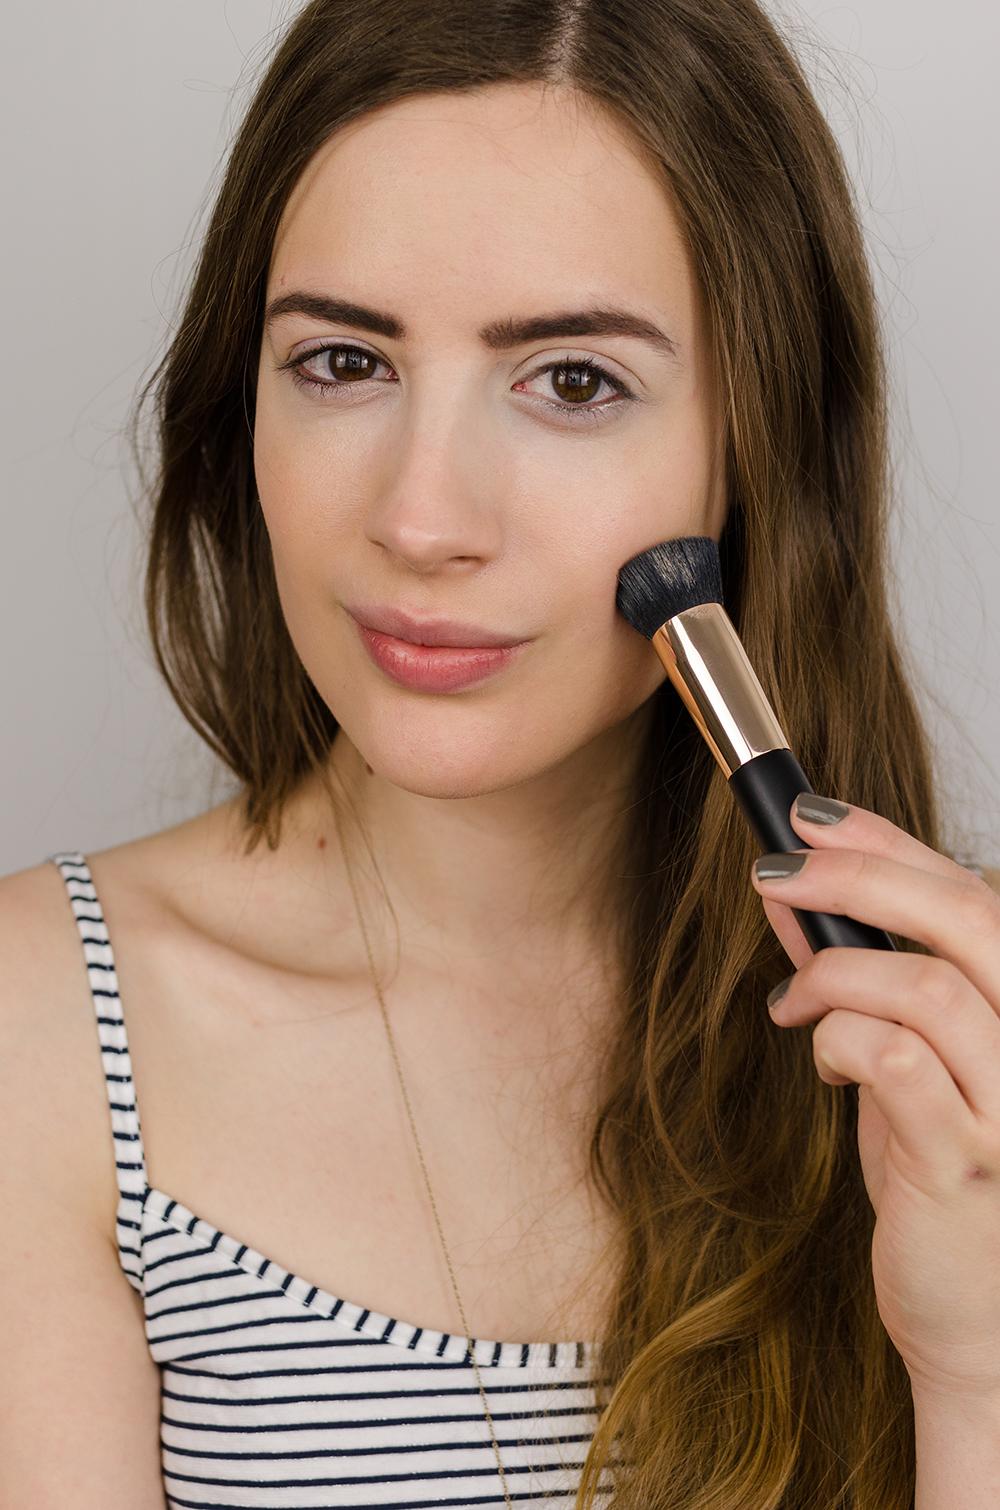 Cut Crease-Schminktrend-Augen Make-Up-Beautyblog-Instagram Trend-andysparkles.de